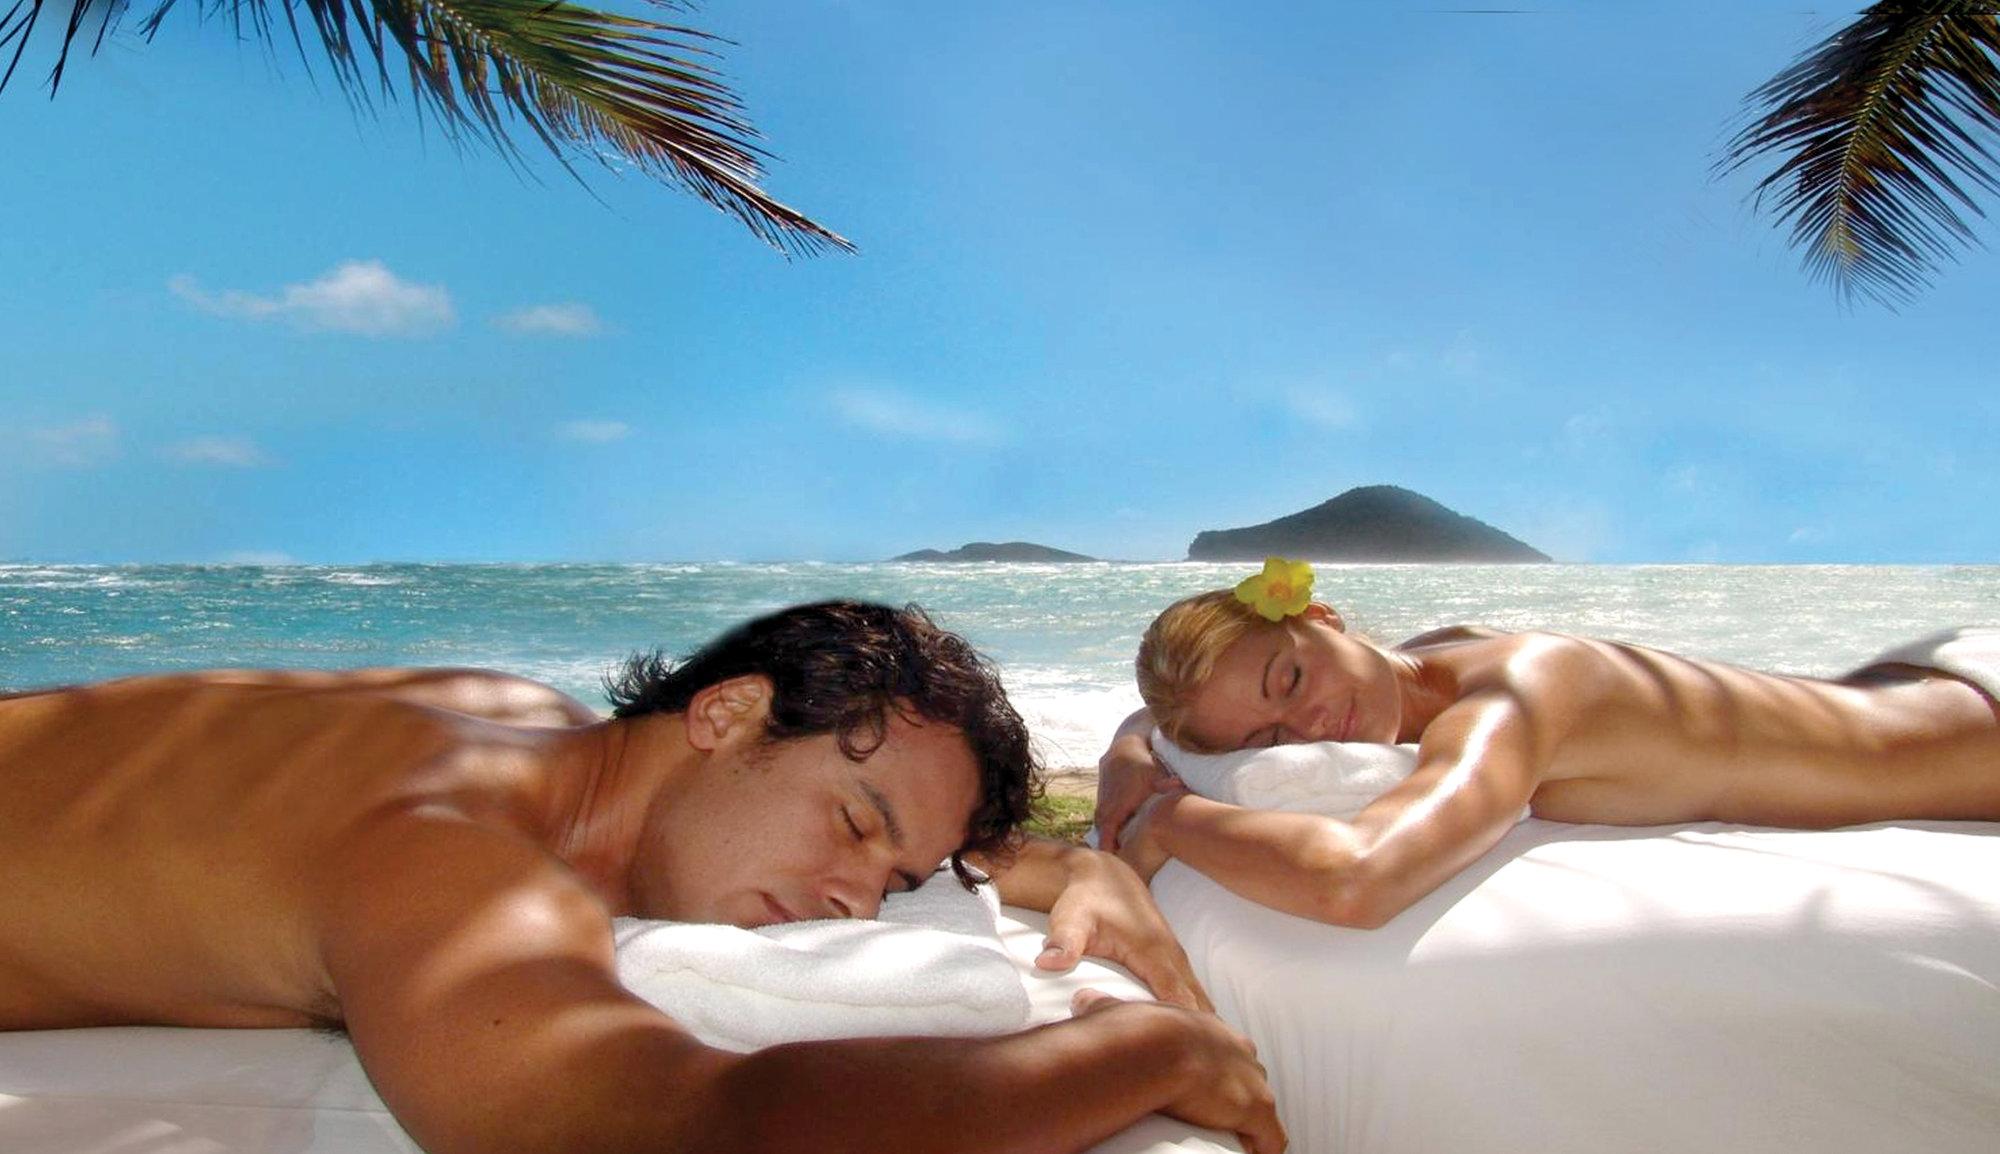 Фото семейной пары на отдыхе секс, Секс на пляже частное фото семейных пар 5 фотография